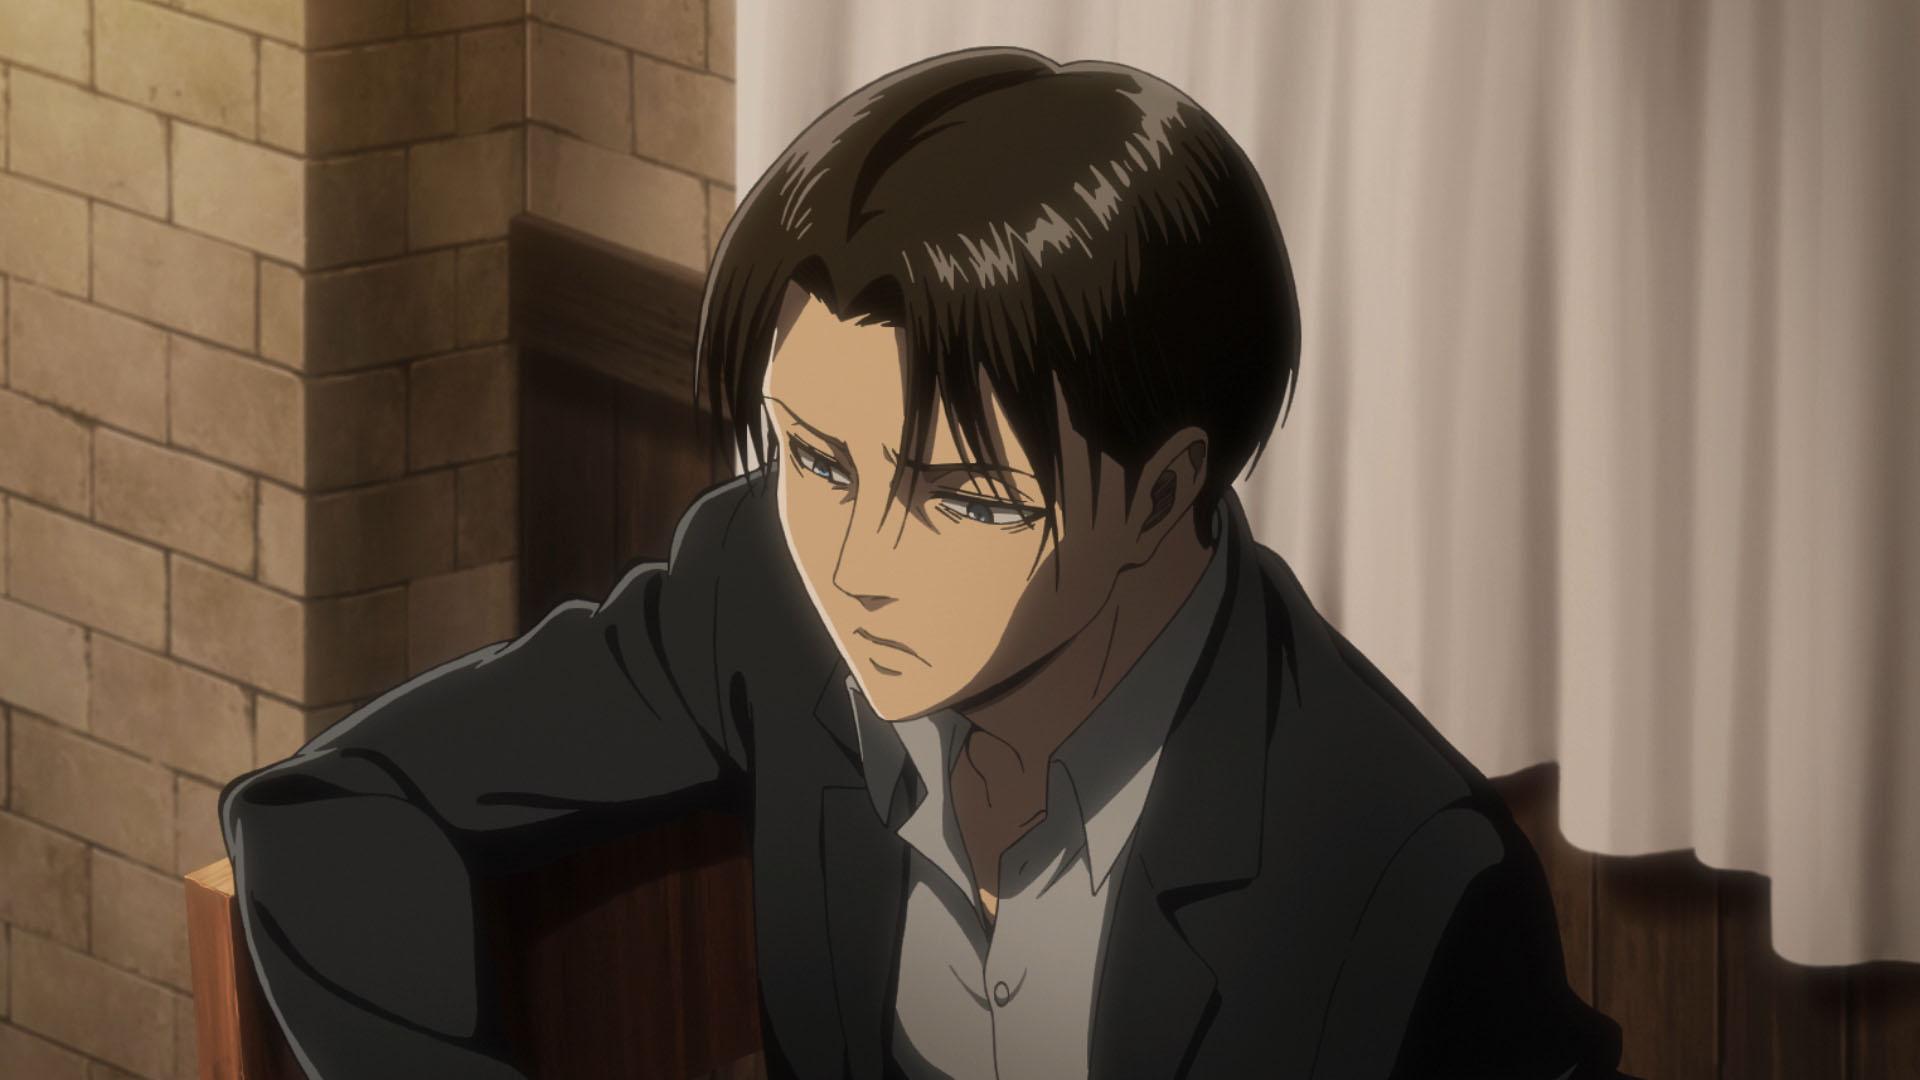 Watch Attack on Titan Season 3 Episode 38 Sub & Dub | Anime